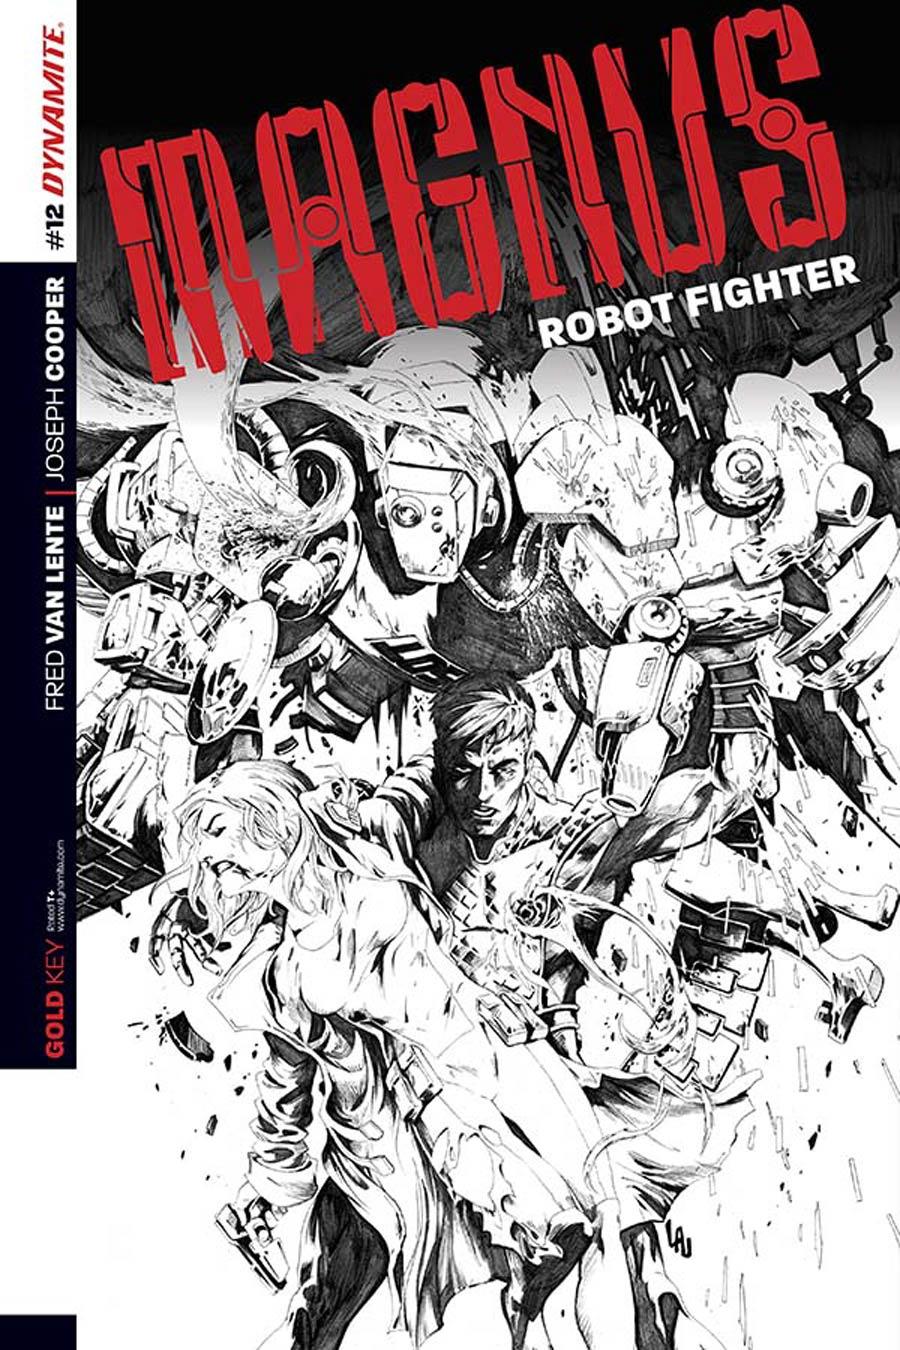 Magnus Robot Fighter Vol 4 #12 Cover C Incentive Jonathan Lau Black & White Cover